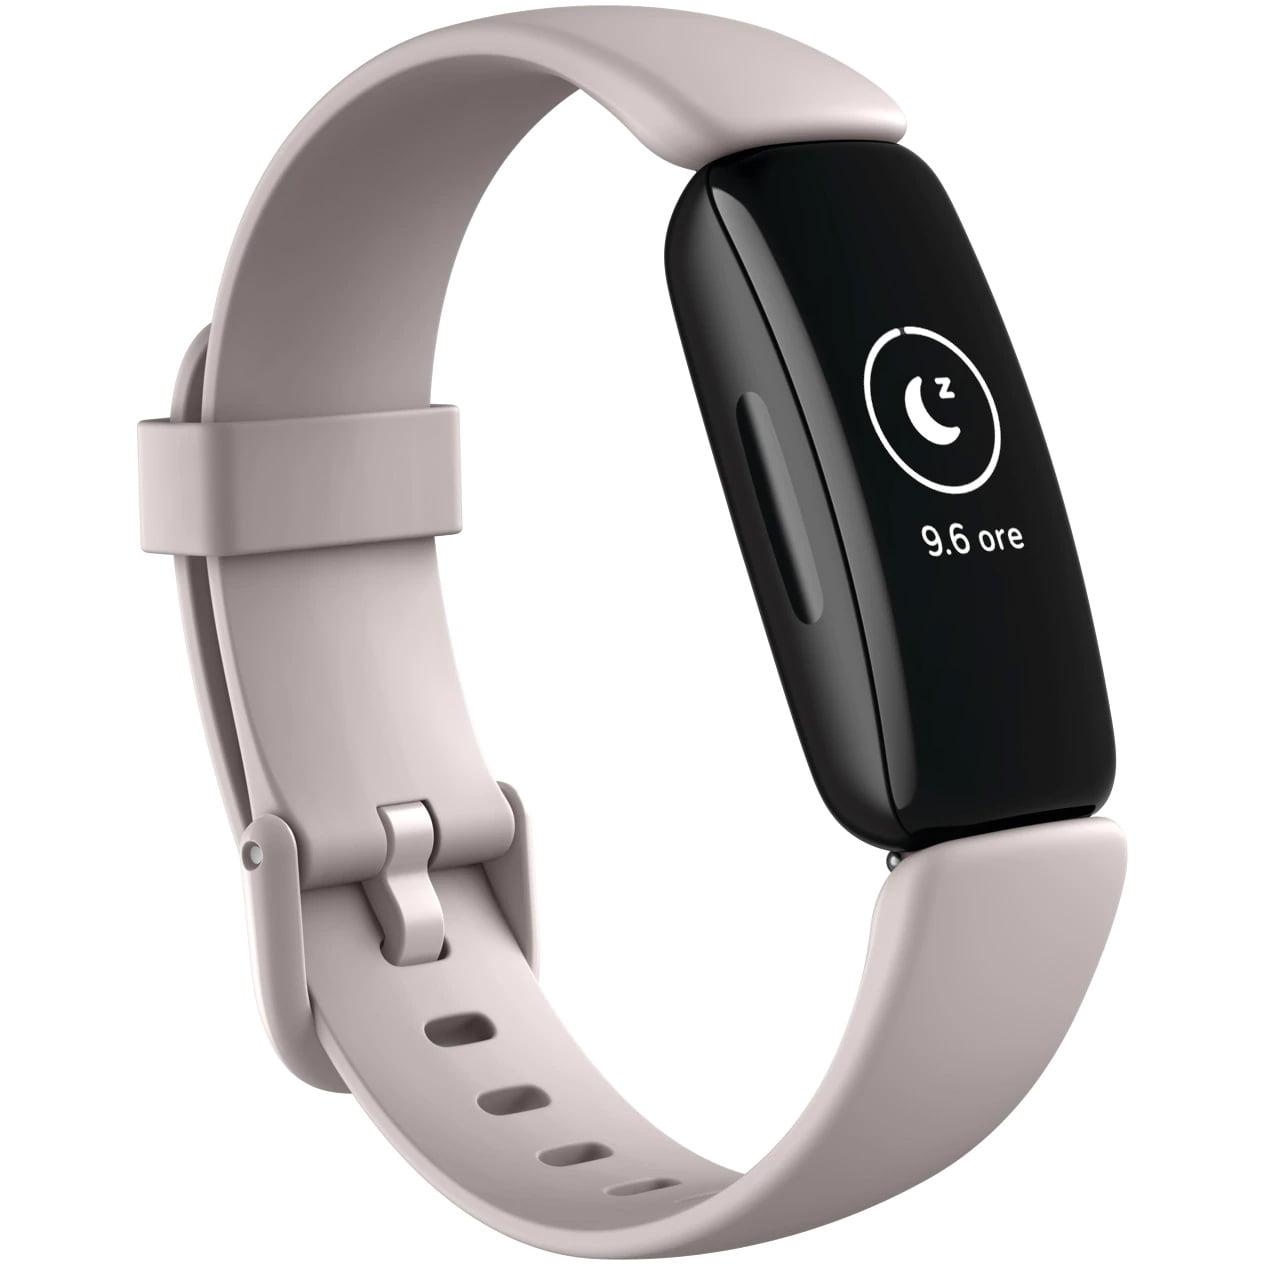 Bratara fitness Fitbit Inspire 2, Silicon, Black Aluminum, Lunar White